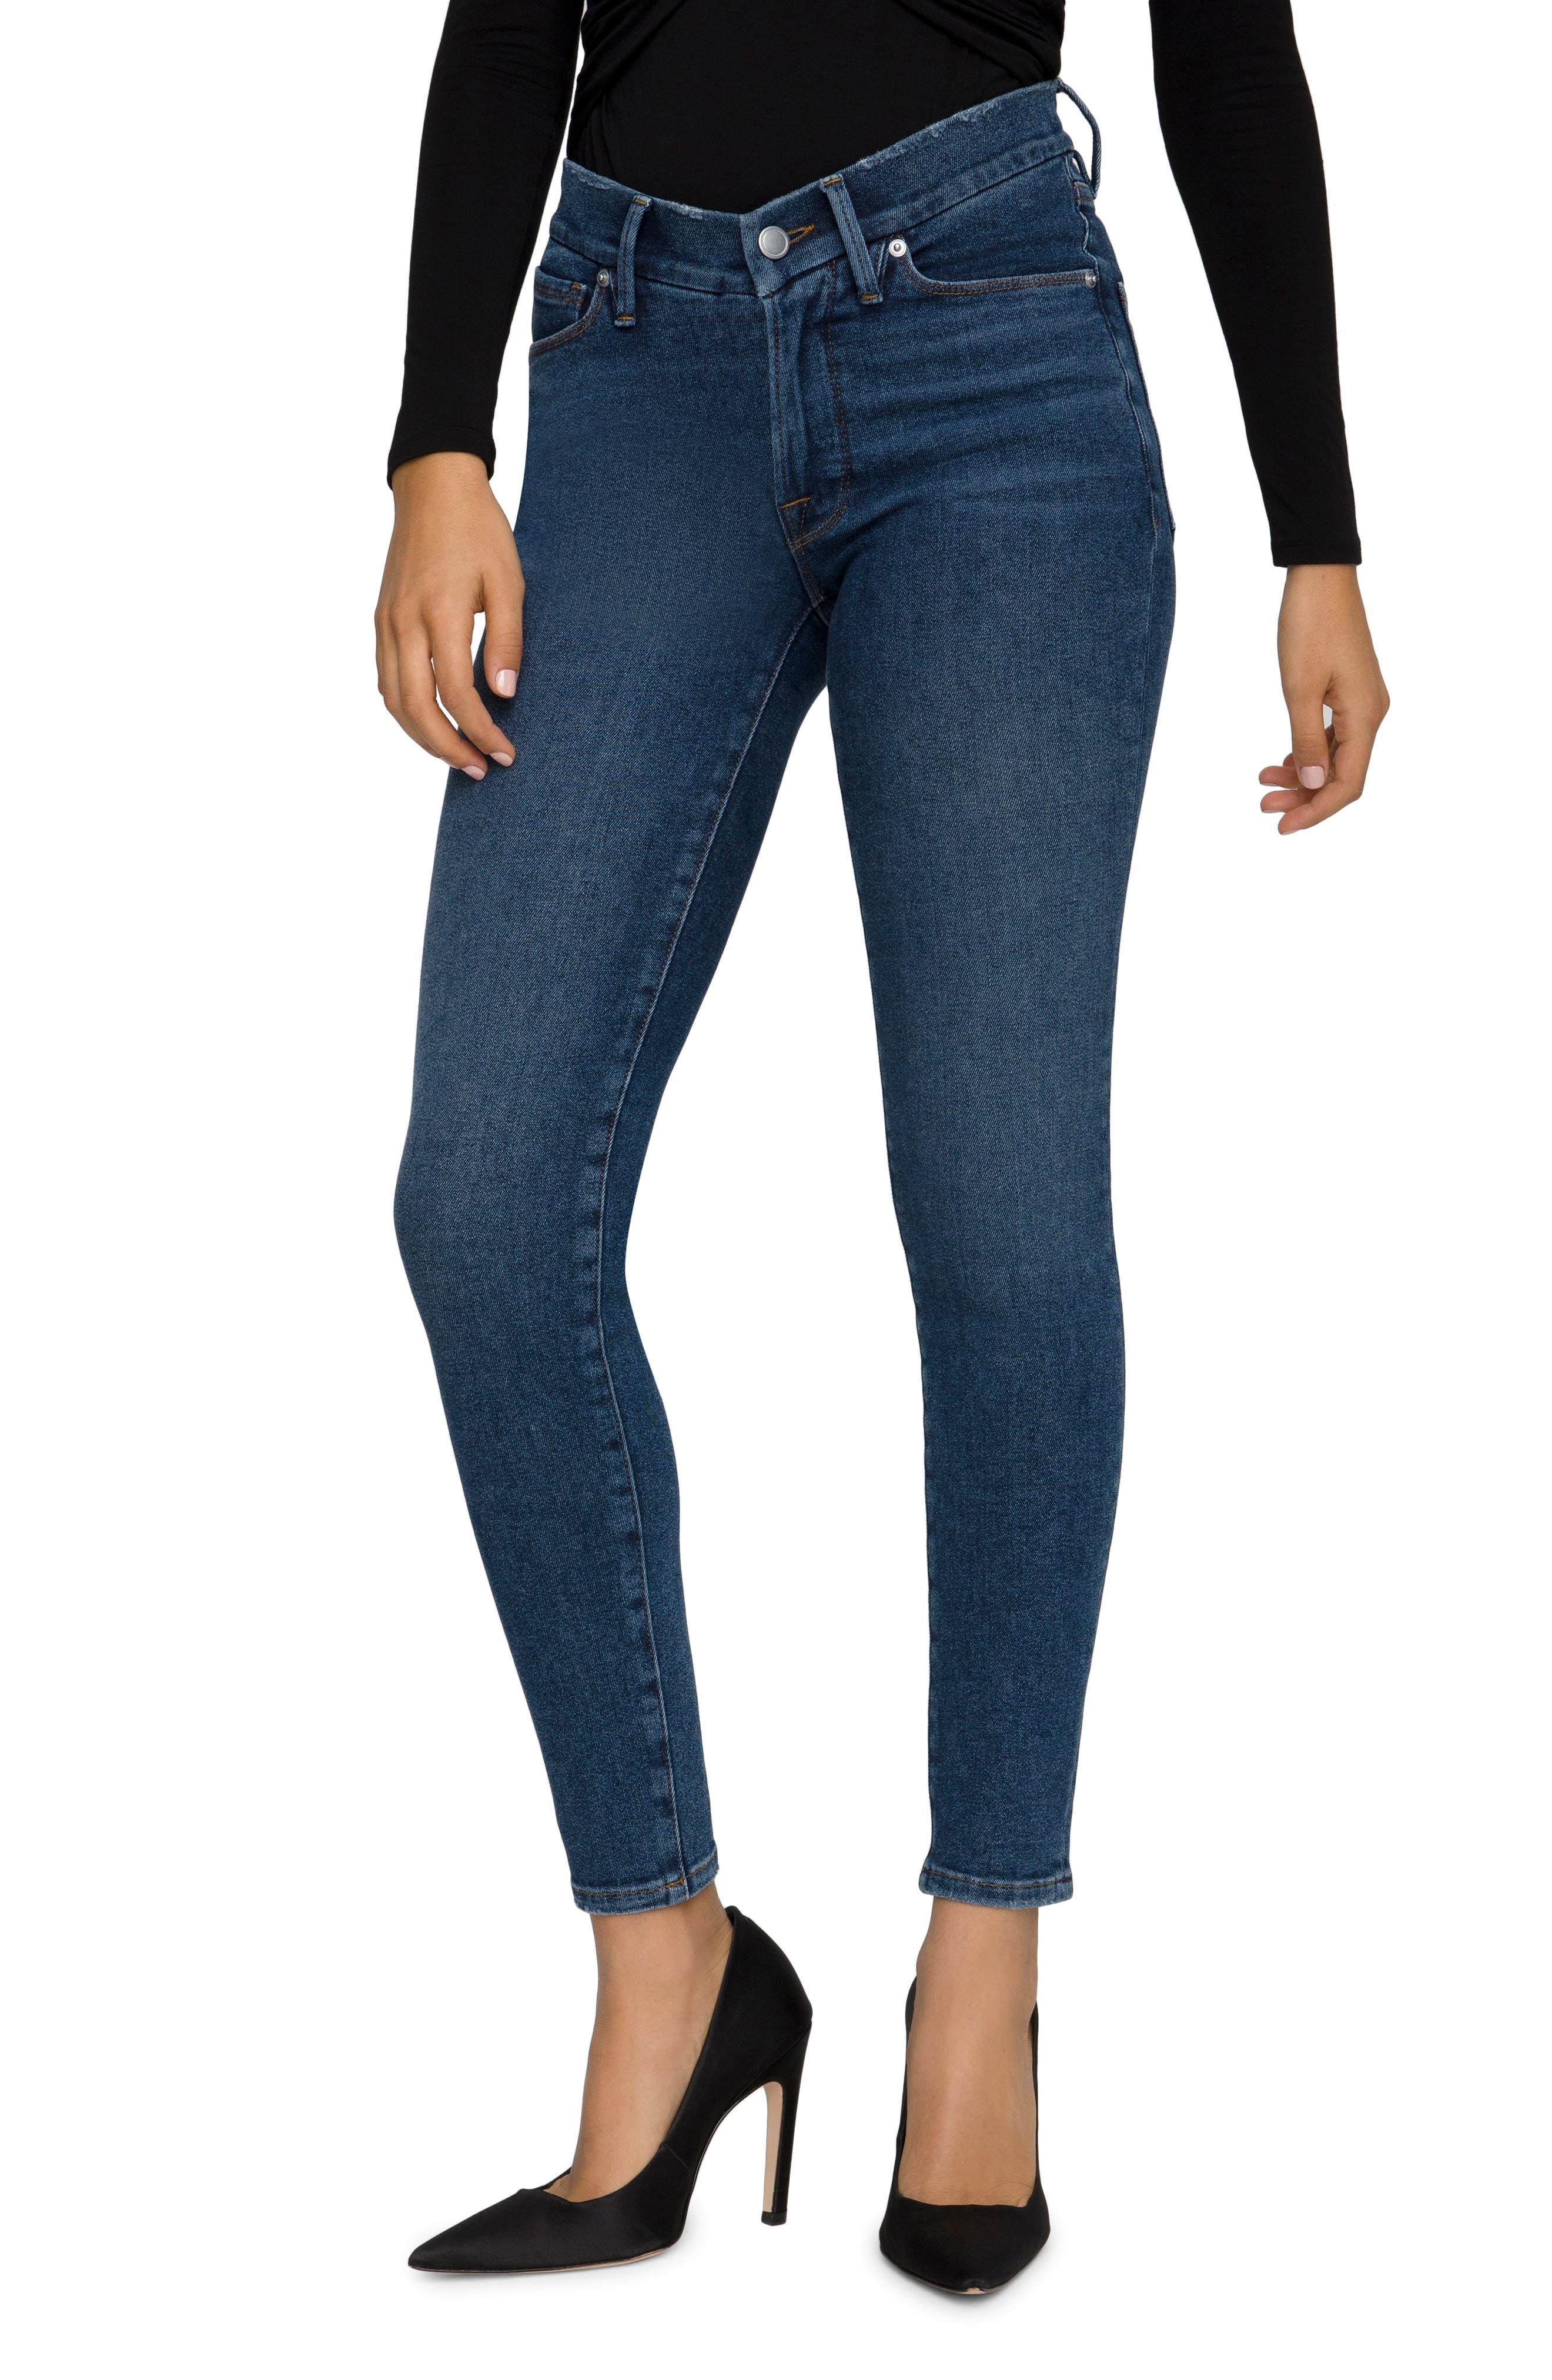 Women's Good American Good Legs Low Rise Ankle Skinny Jeans